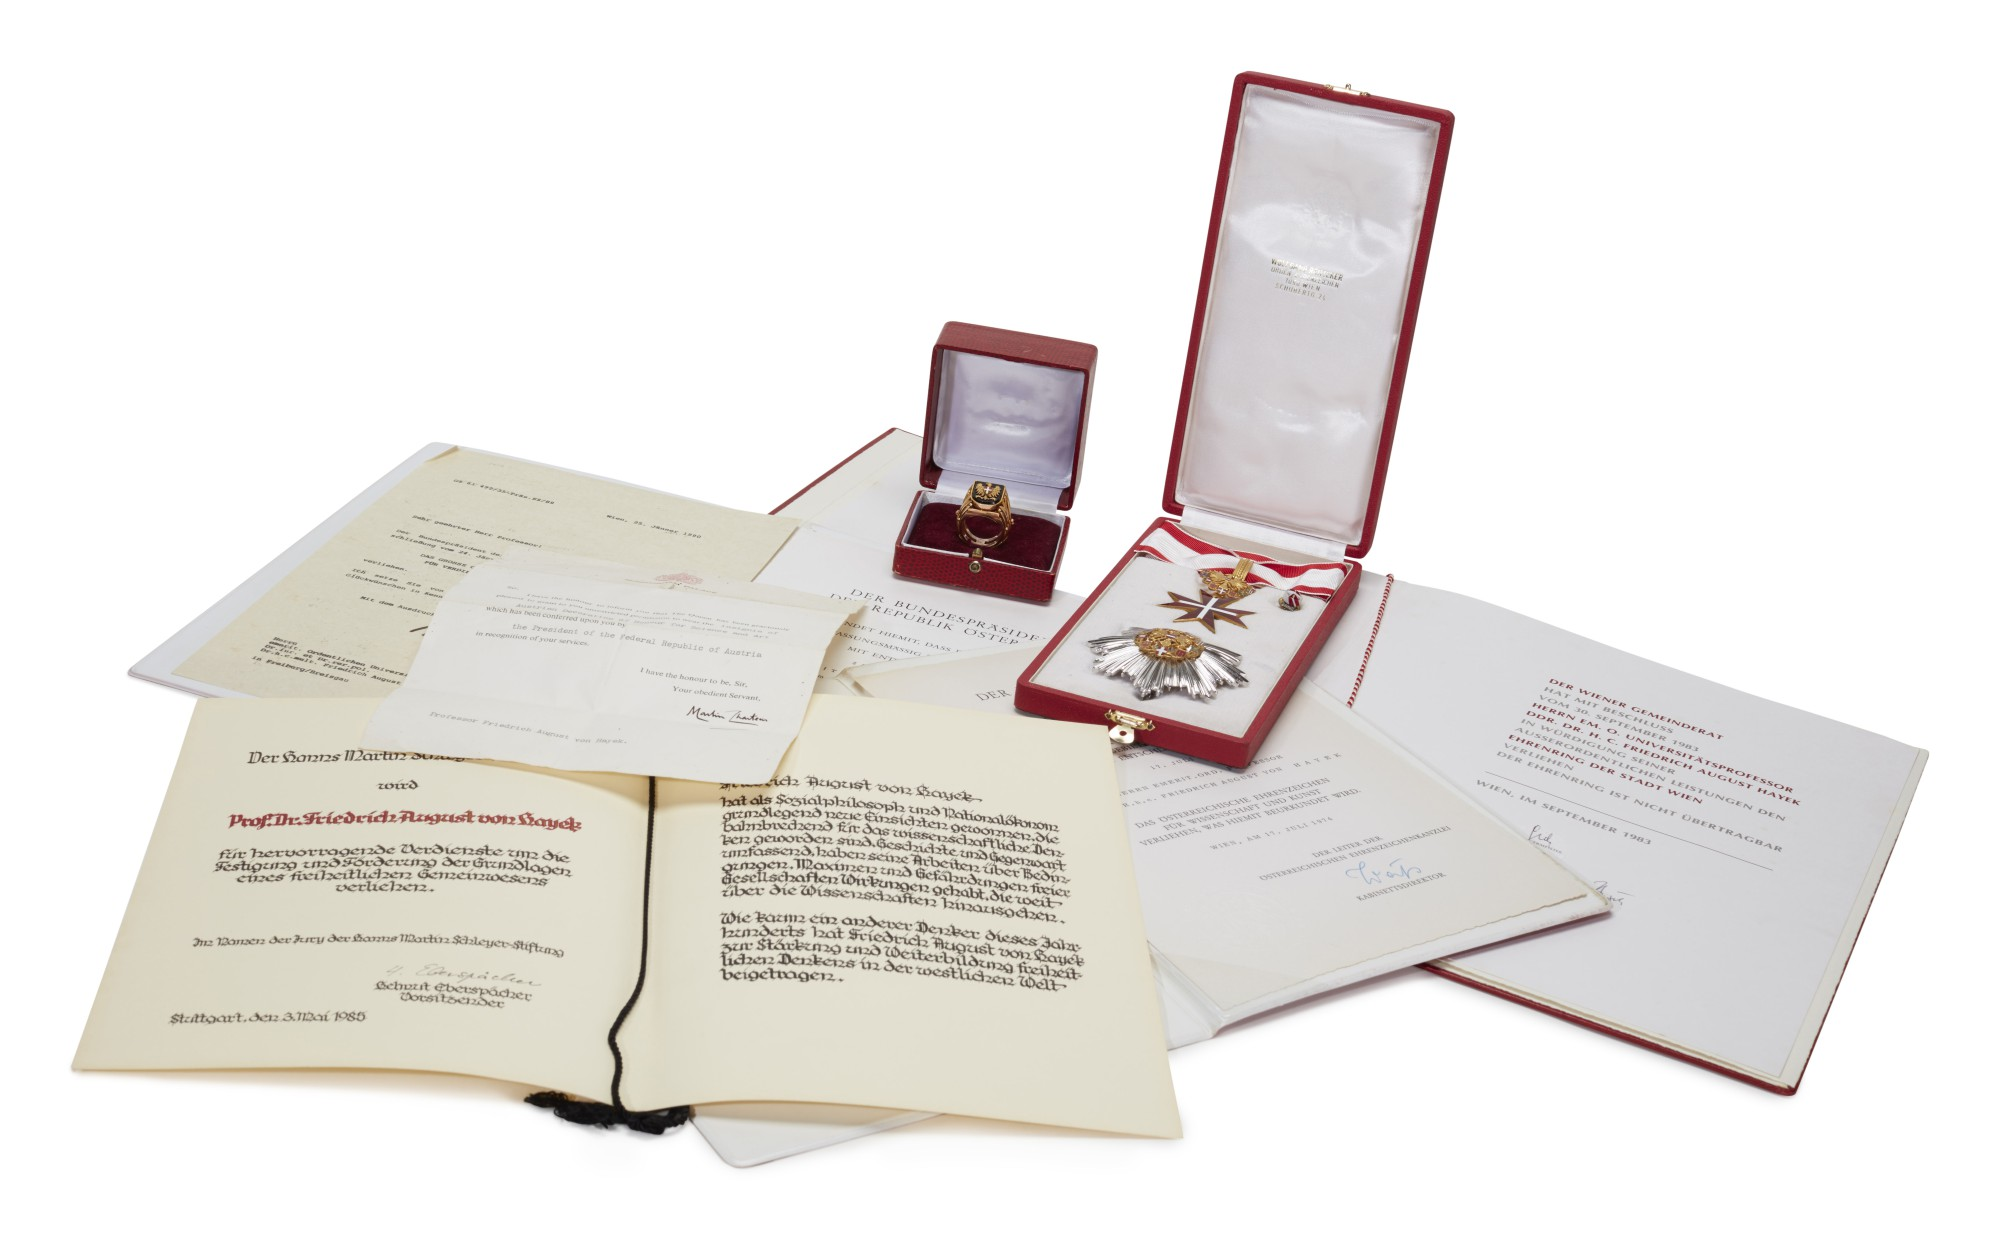 AUSTRIAN CIVIL AWARDS AND DECORATIONS, 1974-1990